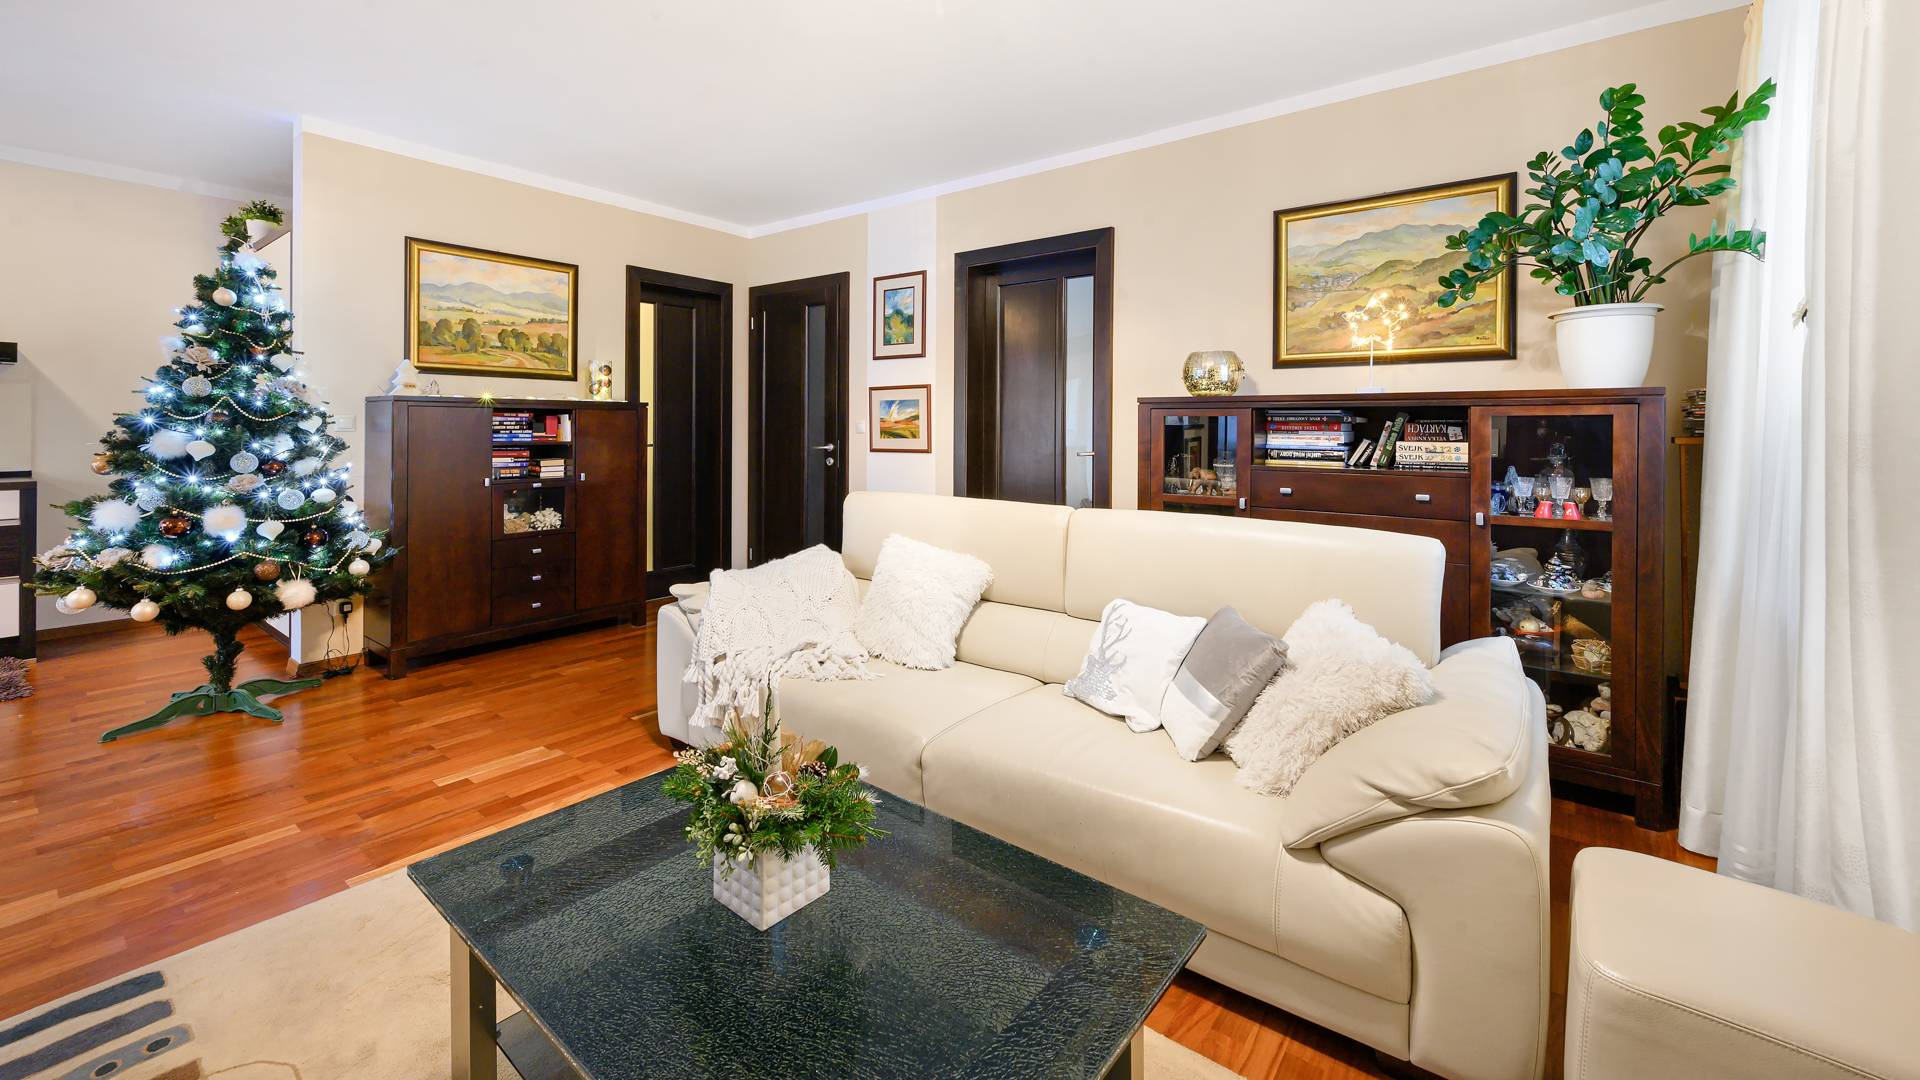 Charizmatický 3 izb. byt v tehlovej novostavbe na ulici K Železnej Studienke Staré Mesto